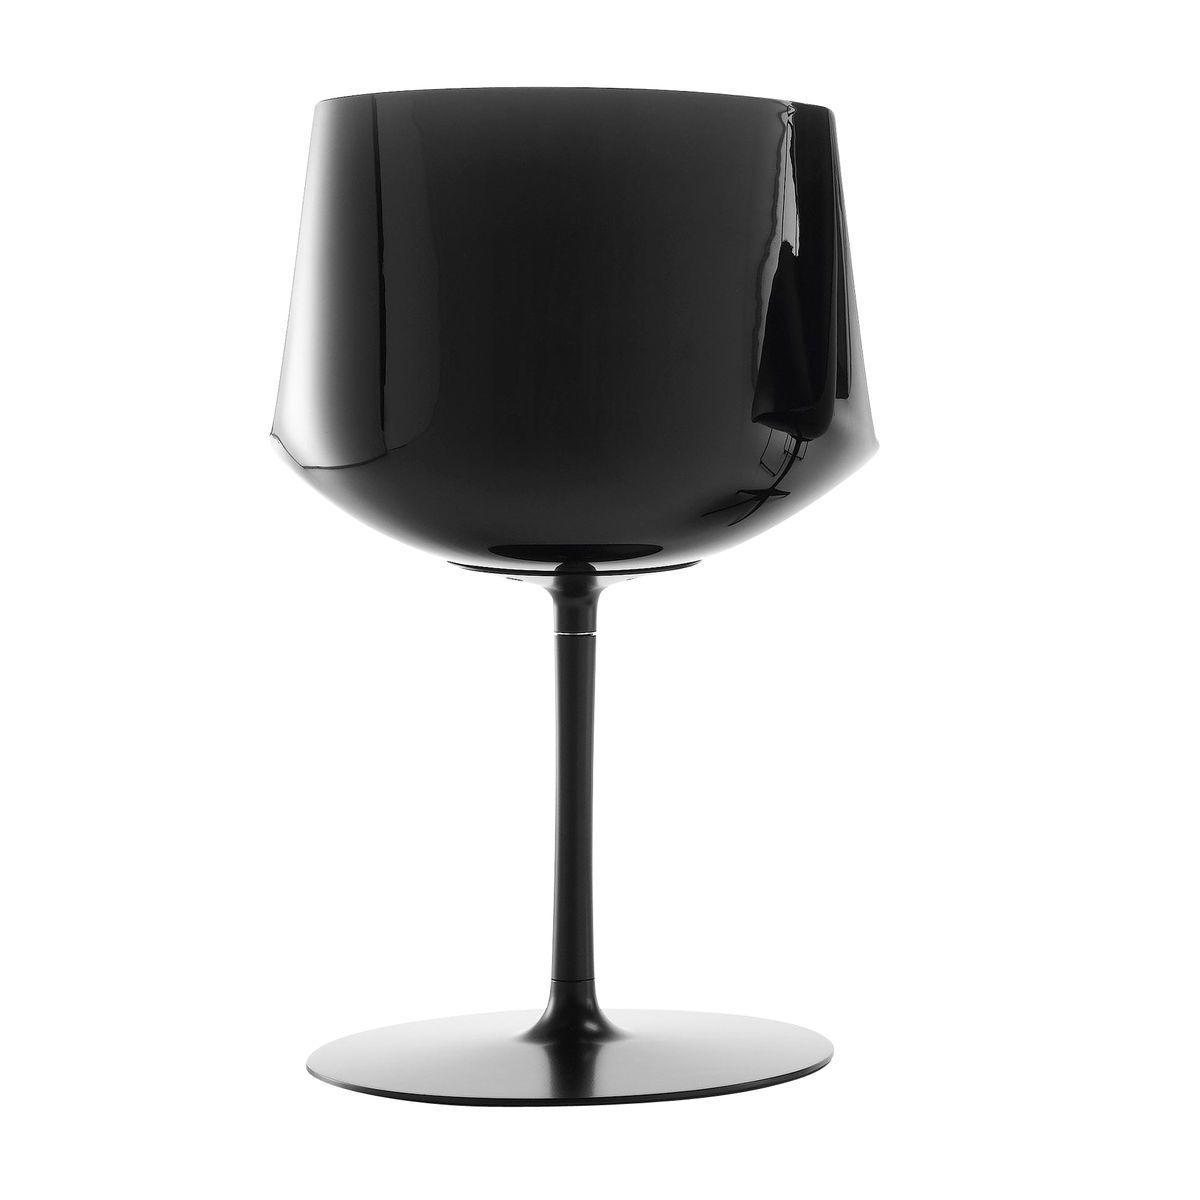 hamac sur pied decathlon. Black Bedroom Furniture Sets. Home Design Ideas